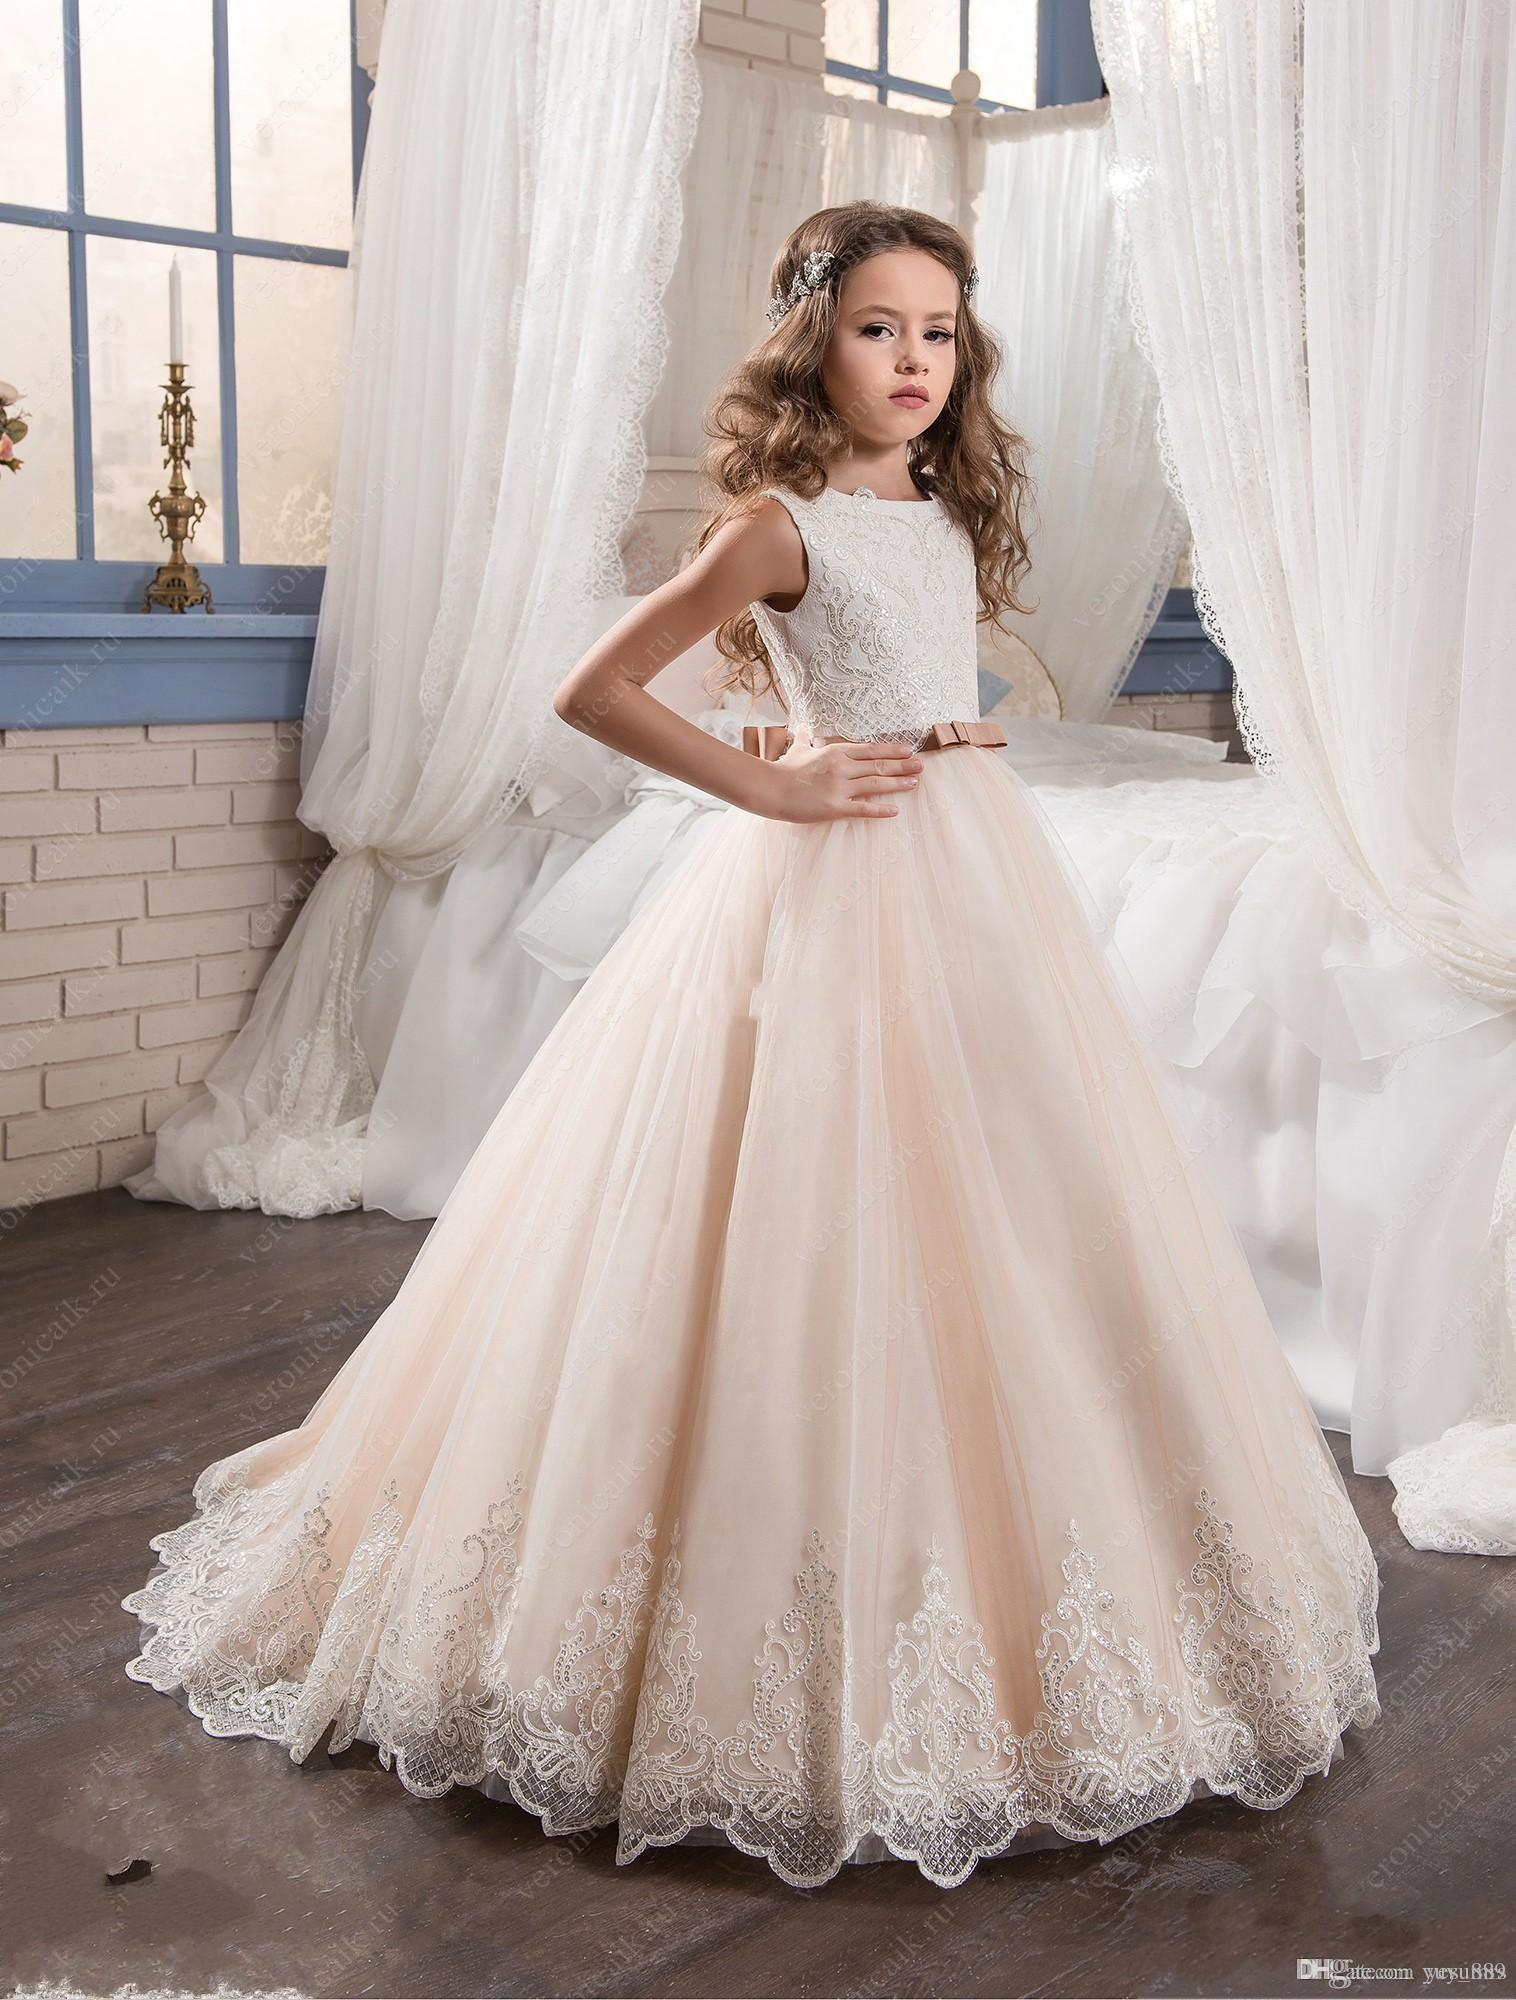 Flower Girl Dresses for Wedding Blush Pink Princess Tutu Sequined Appliqued Lace Bow 2017 Vintage Child First Communion Dress